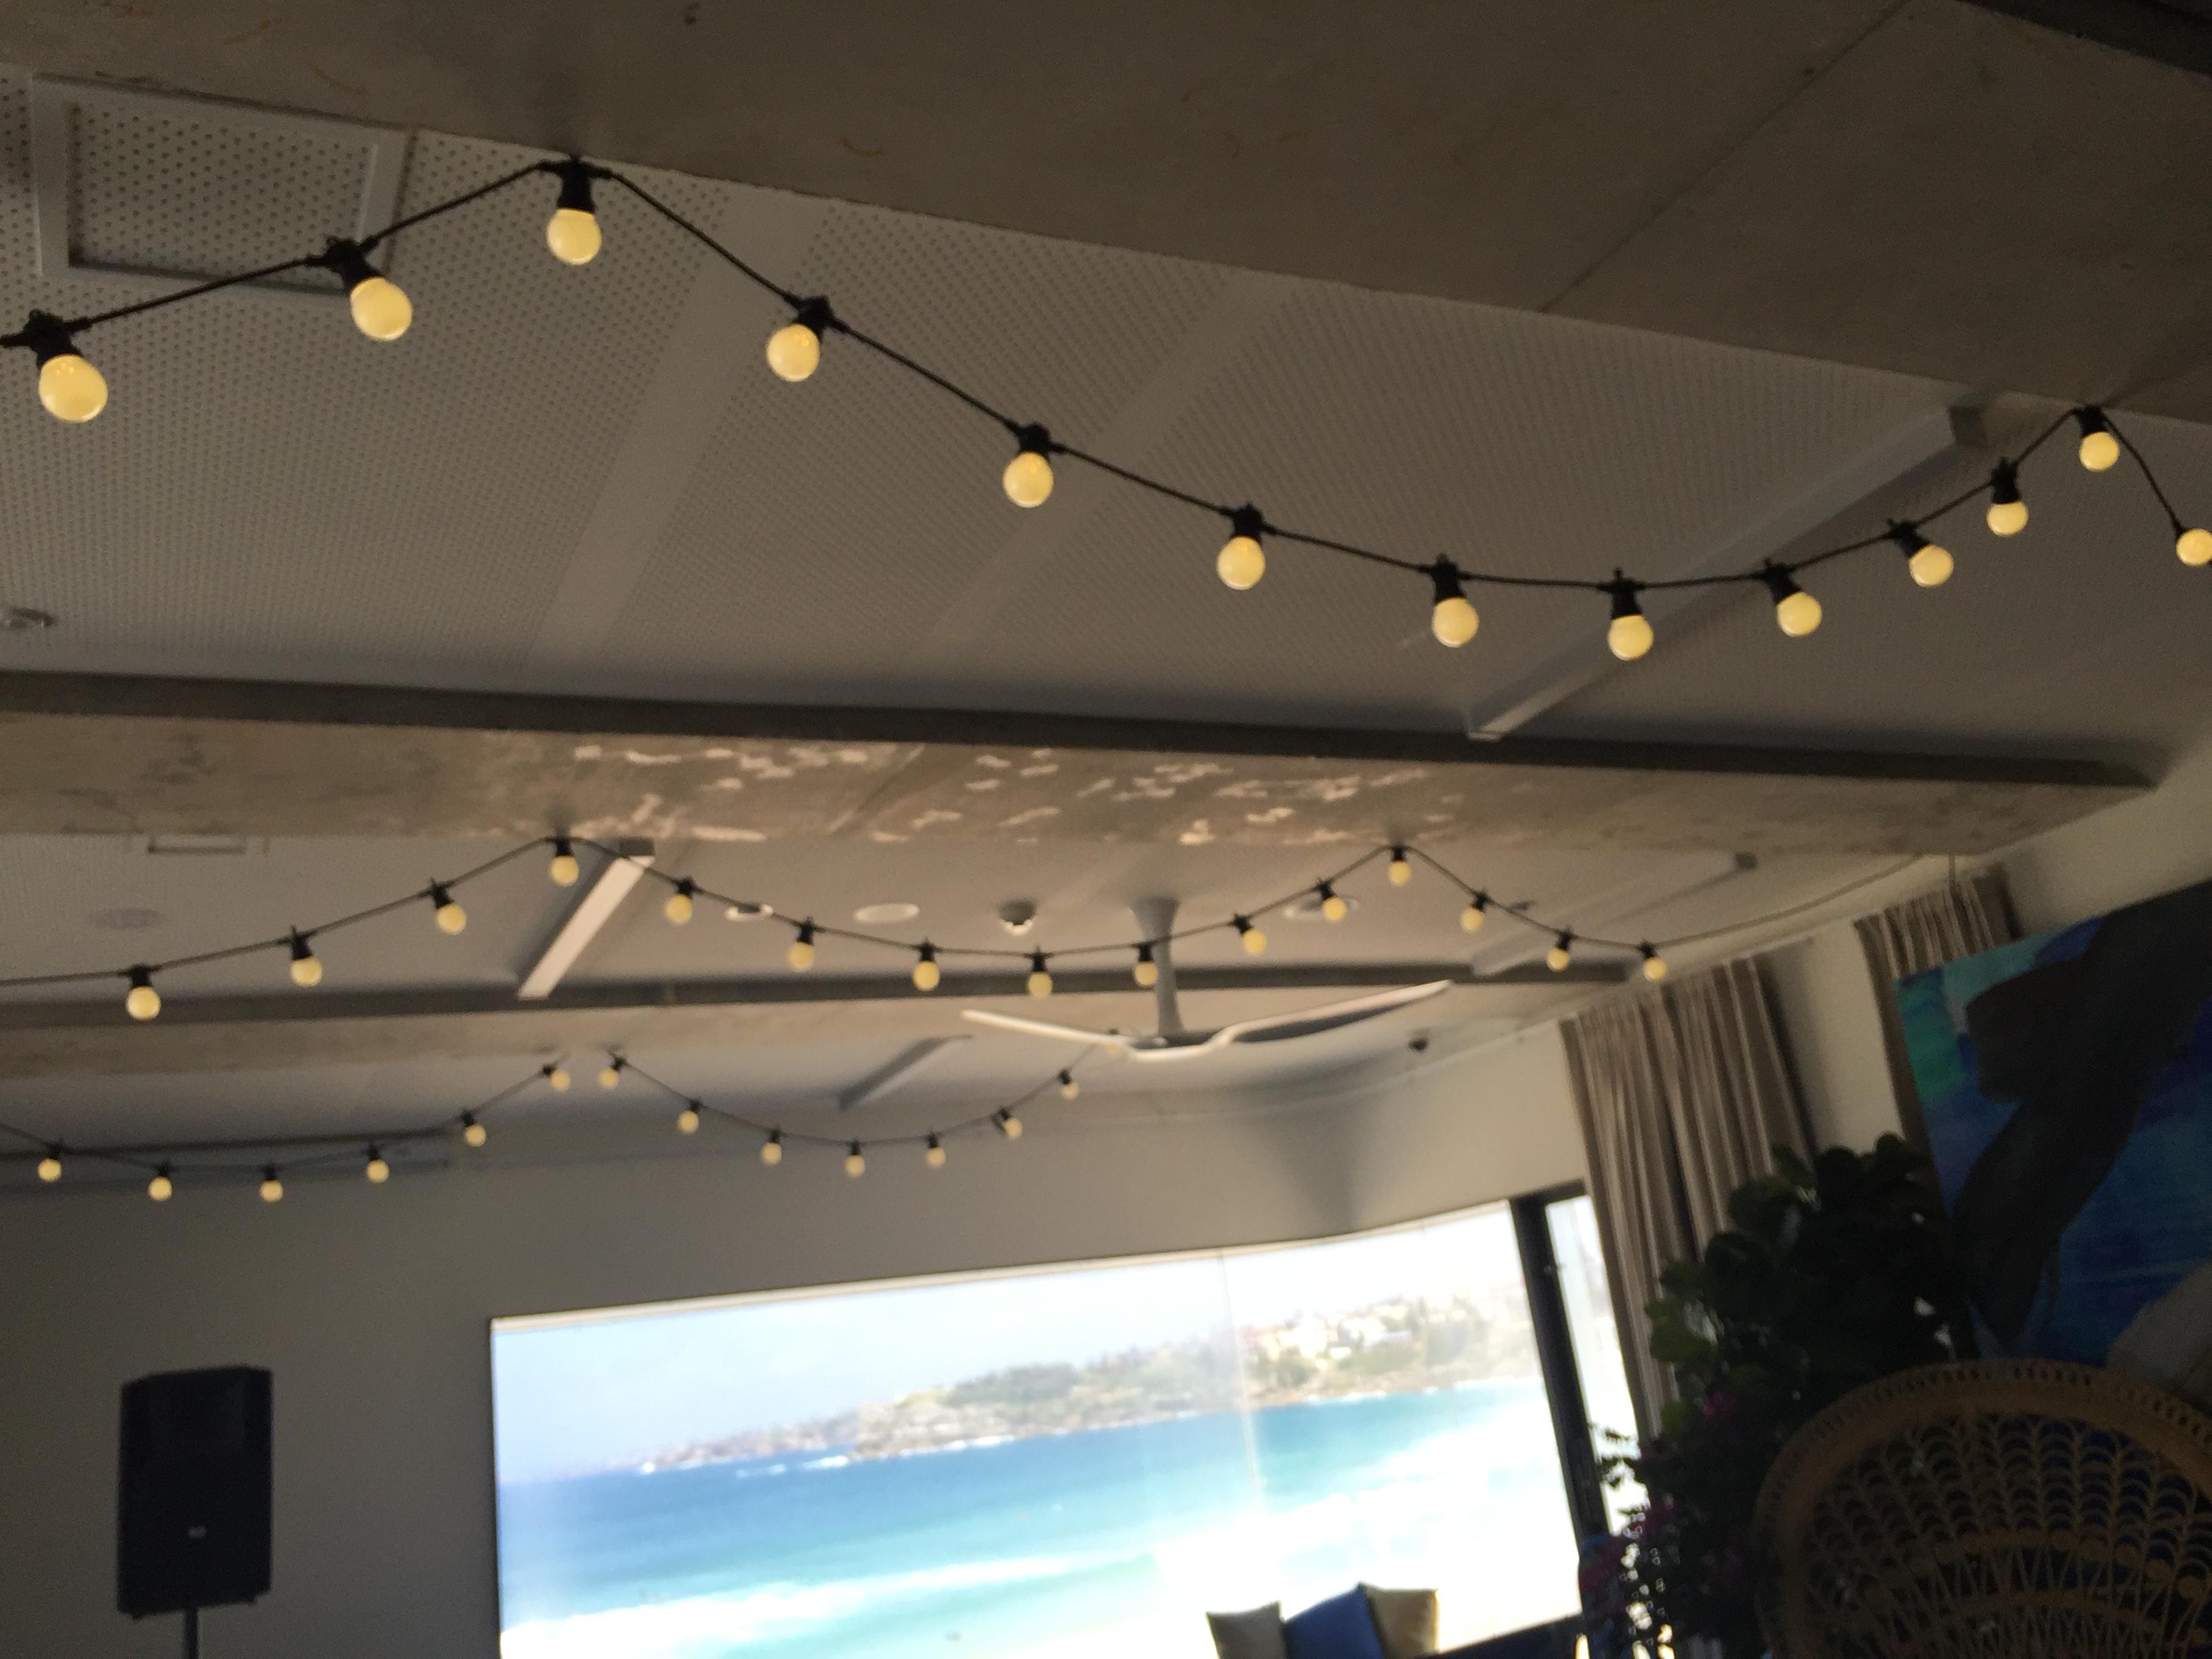 Lighting-legends-big-bulbs